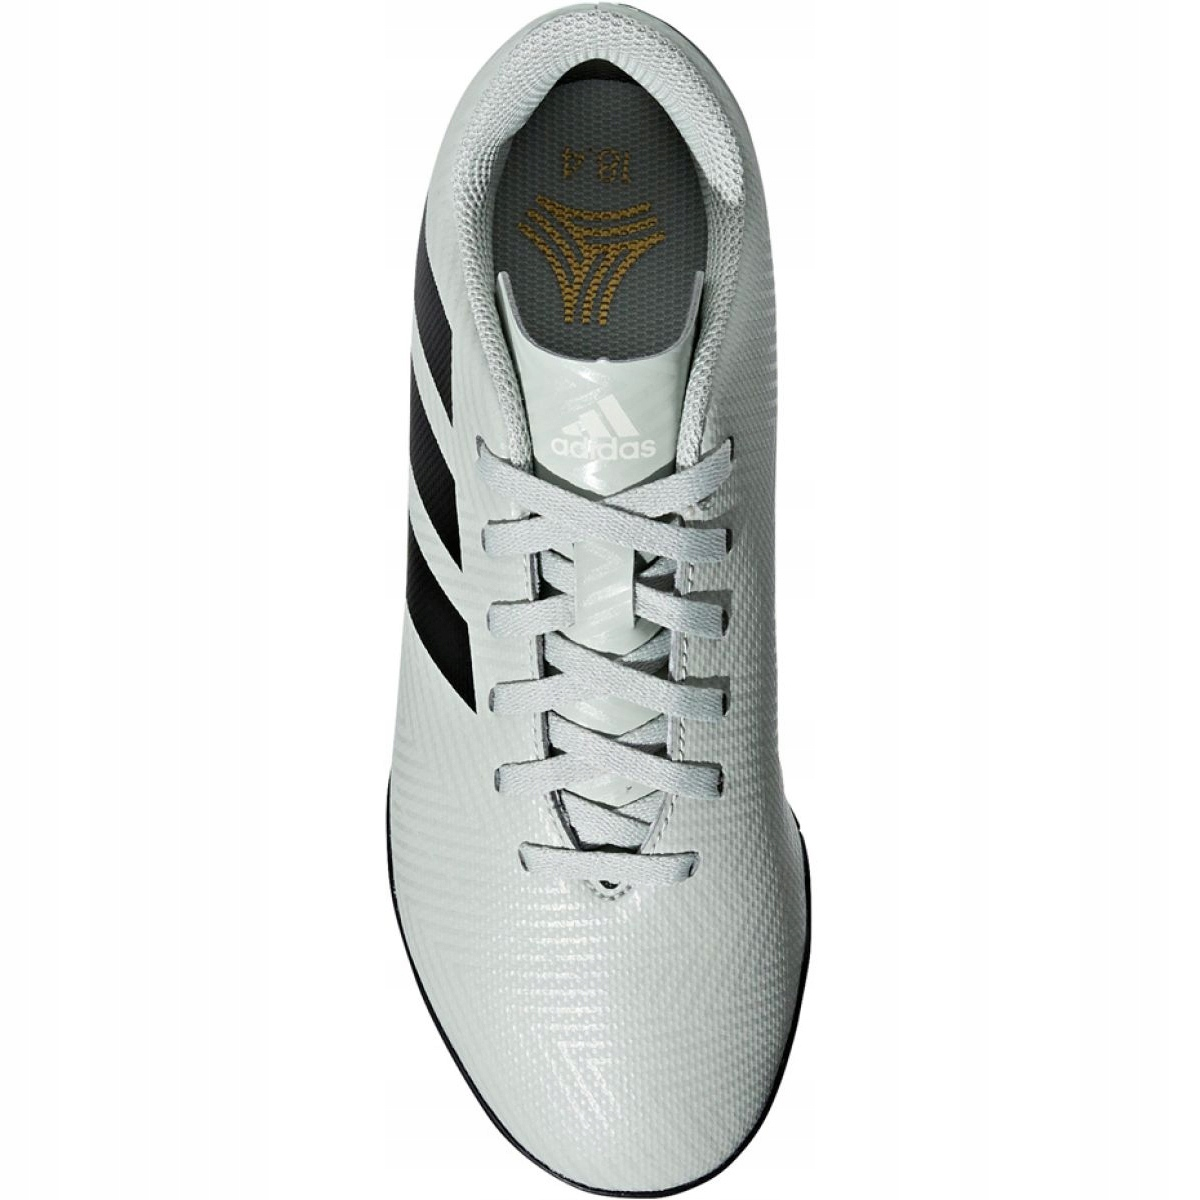 Consentimiento Firmar de ahora en adelante  Adidas Nemeziz Tango 18.4 Tf Jr DB2380 football shoes white multicolored -  ButyModne.pl